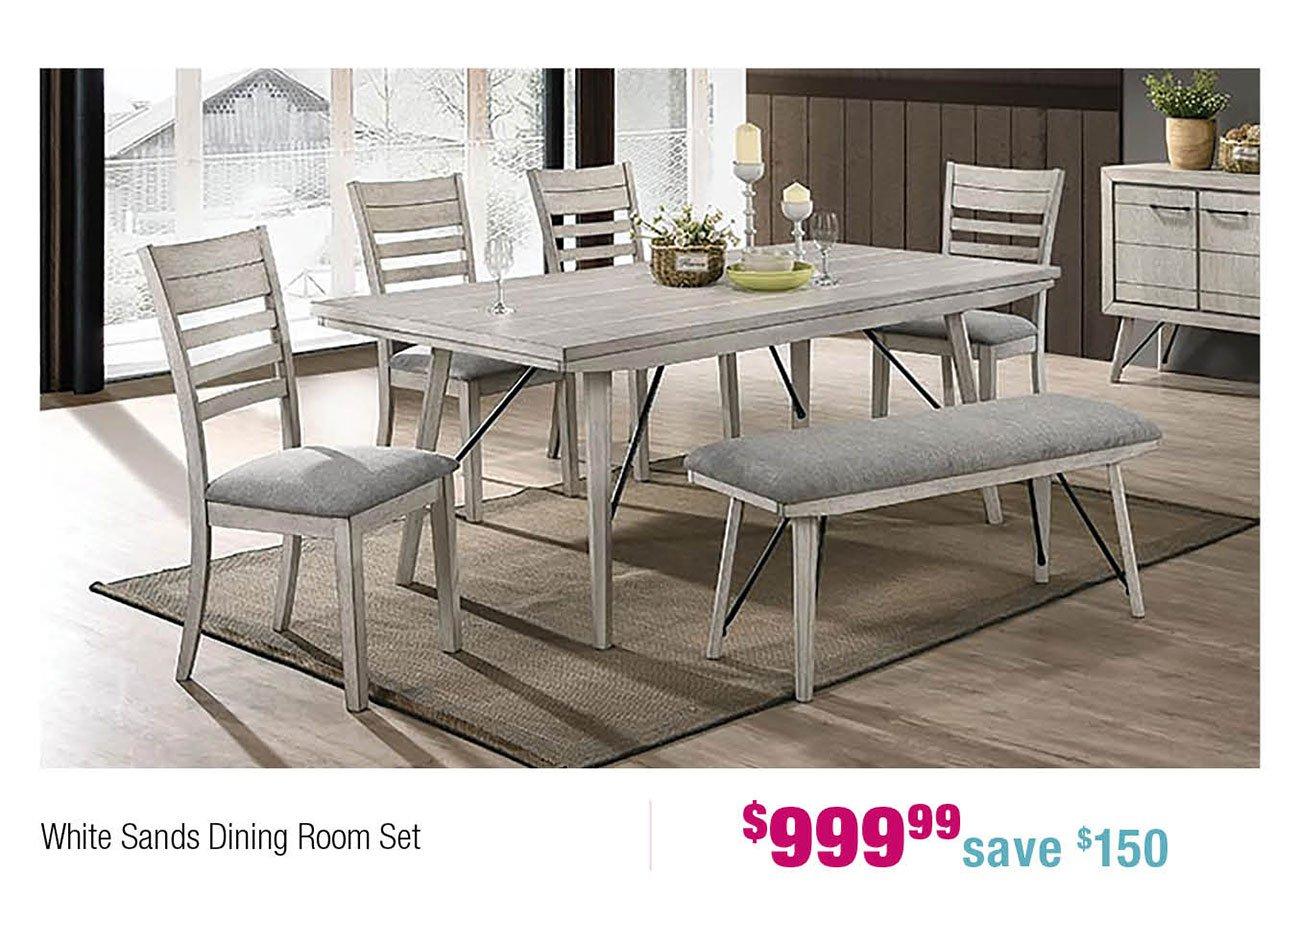 White-sands-dining-room-set